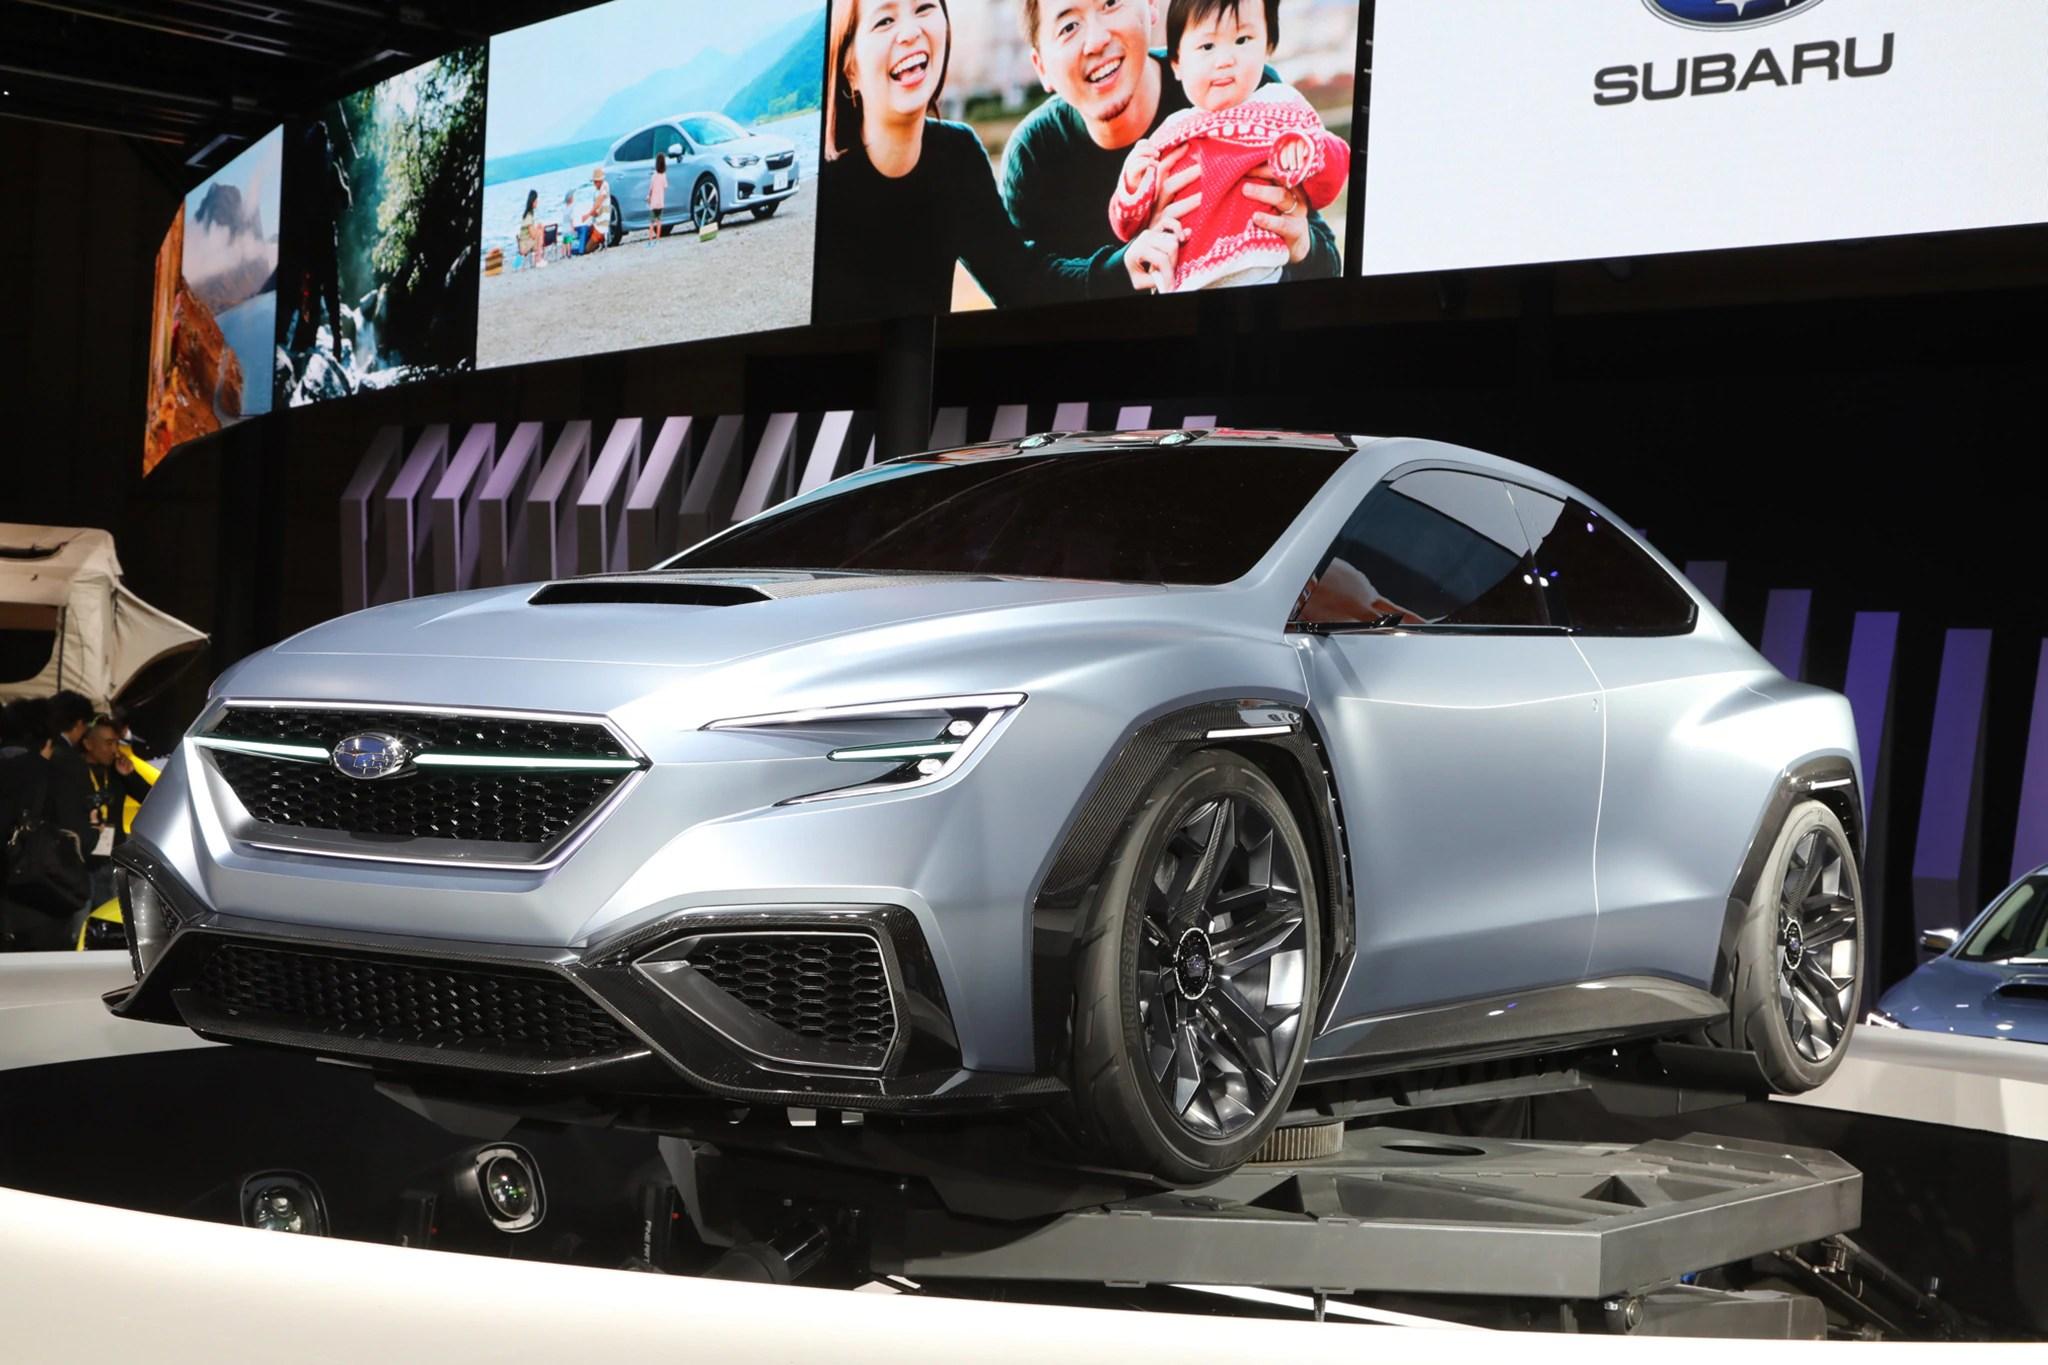 2008 Subaru WRX STI Japanese Spec New Car Reviews and